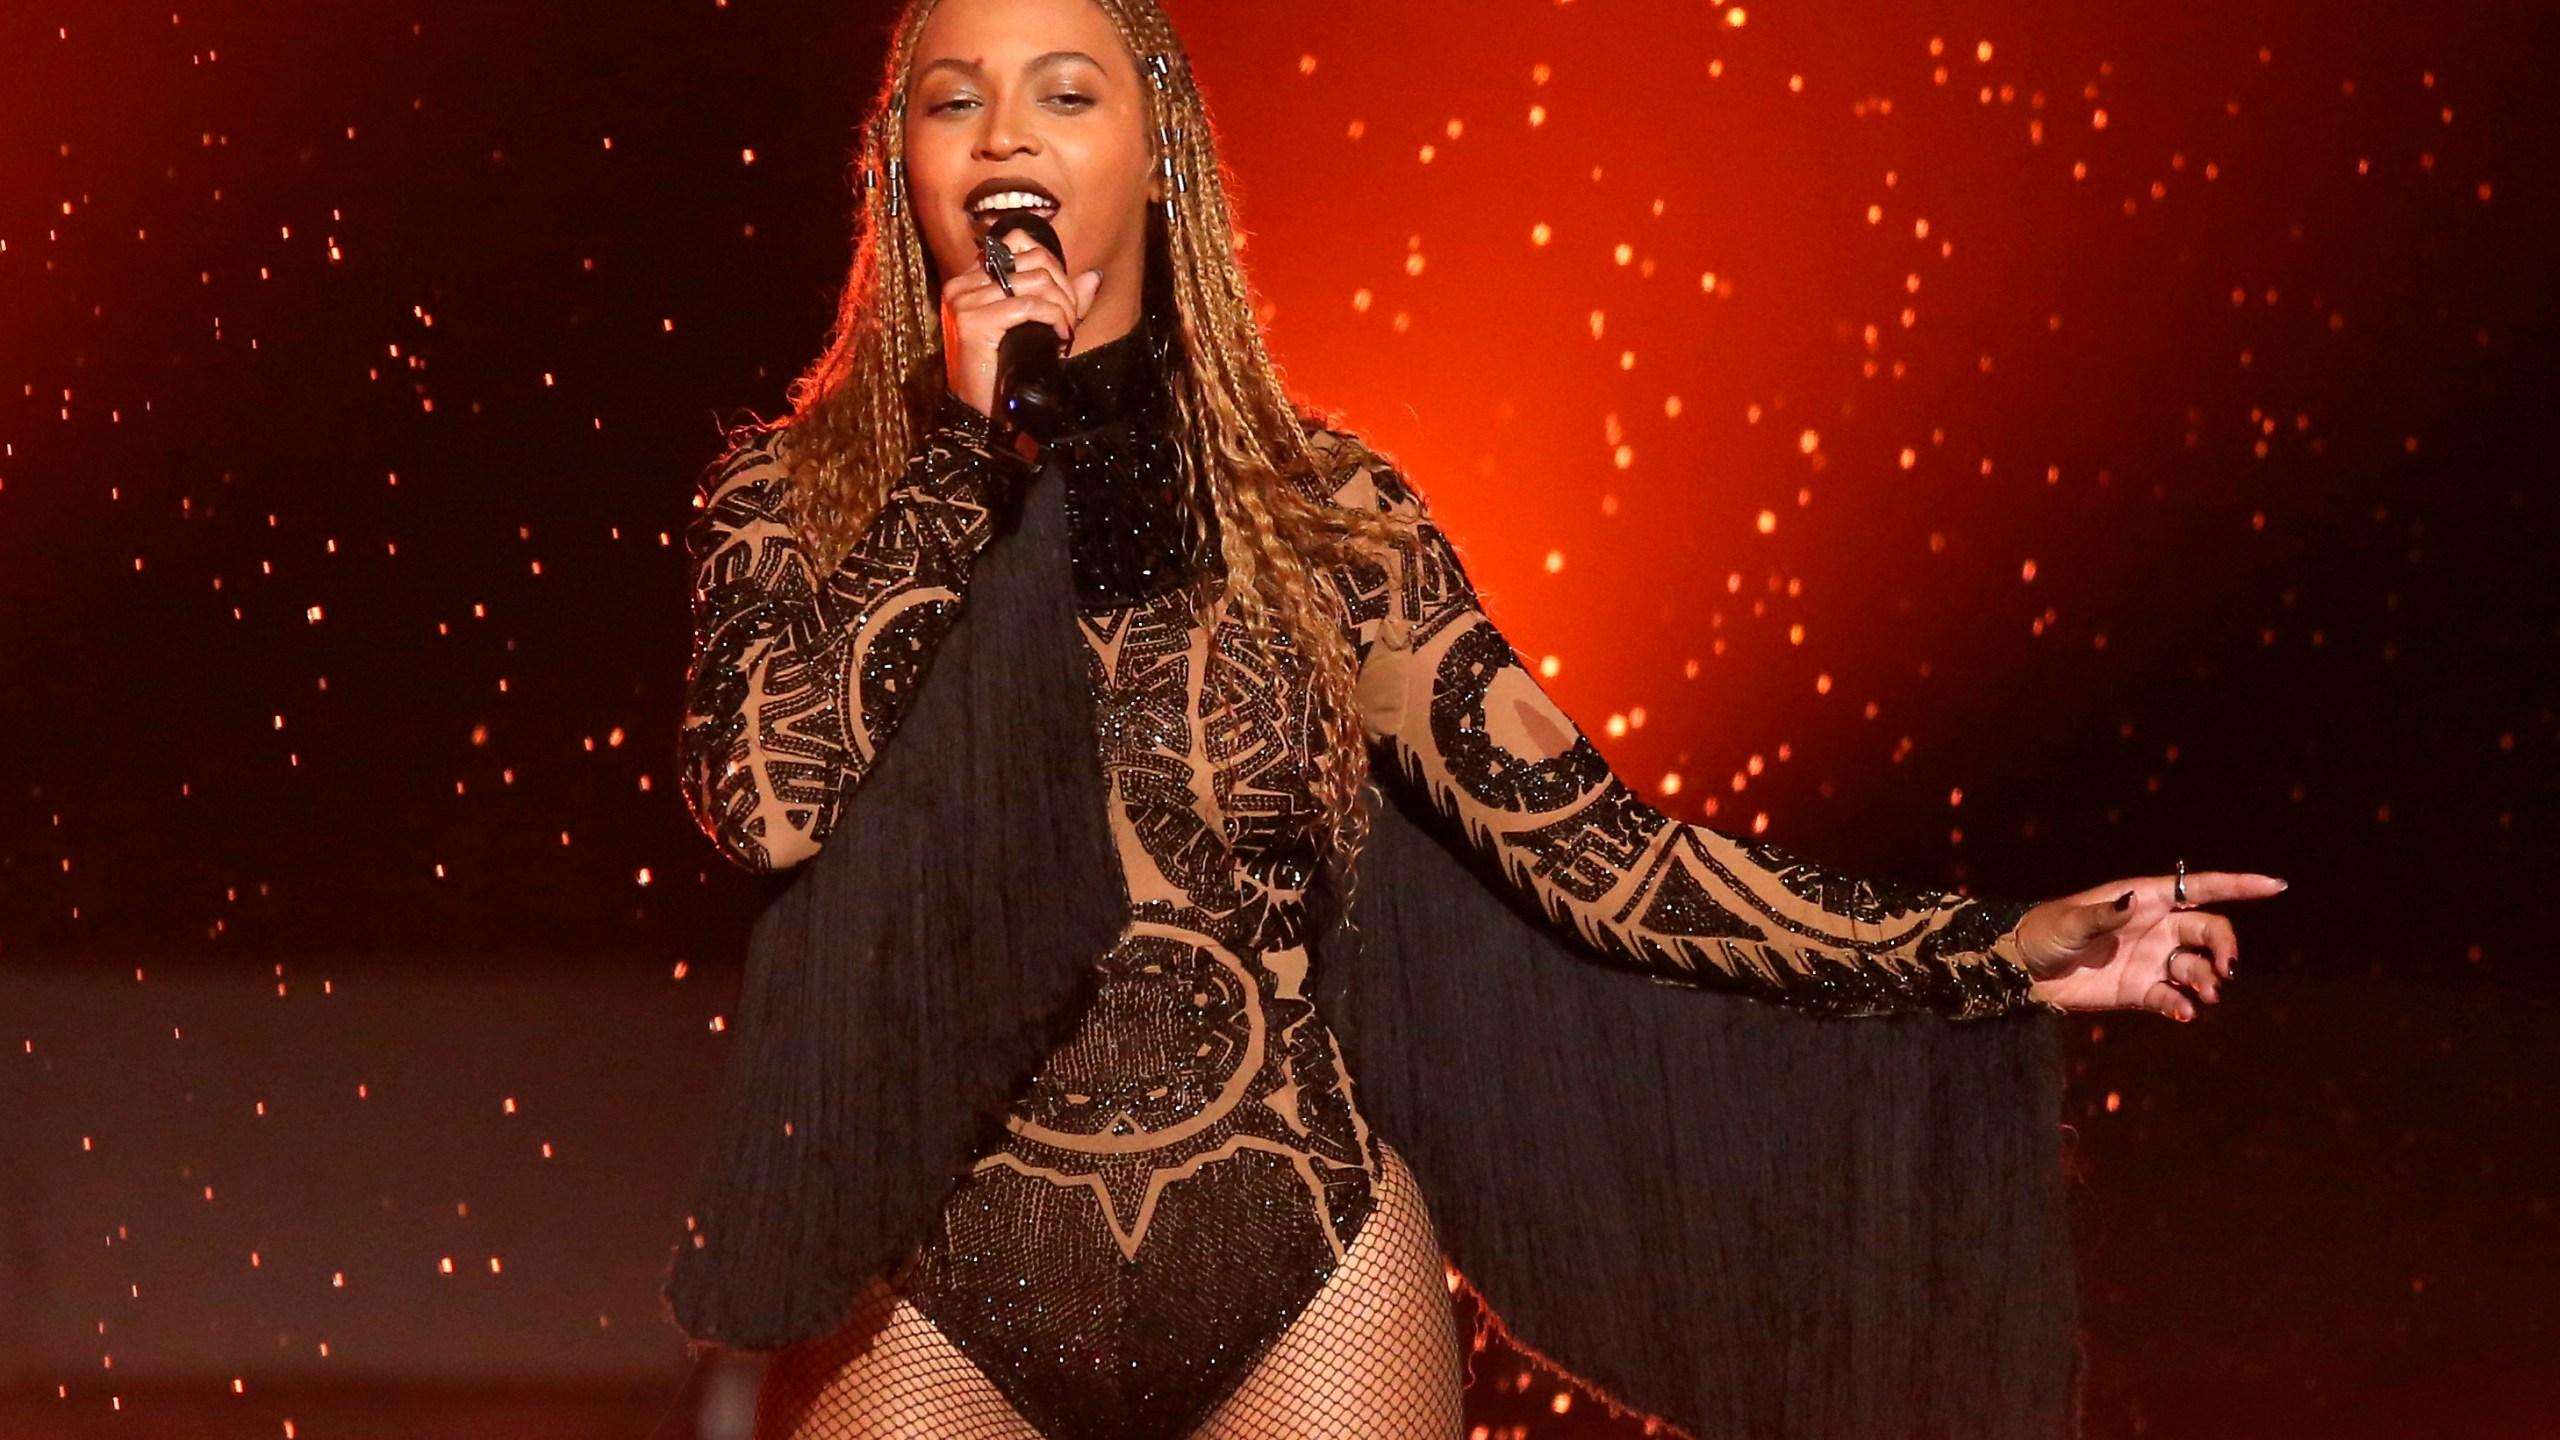 Beyonce-HBCUs_21731-159532.jpg56768505